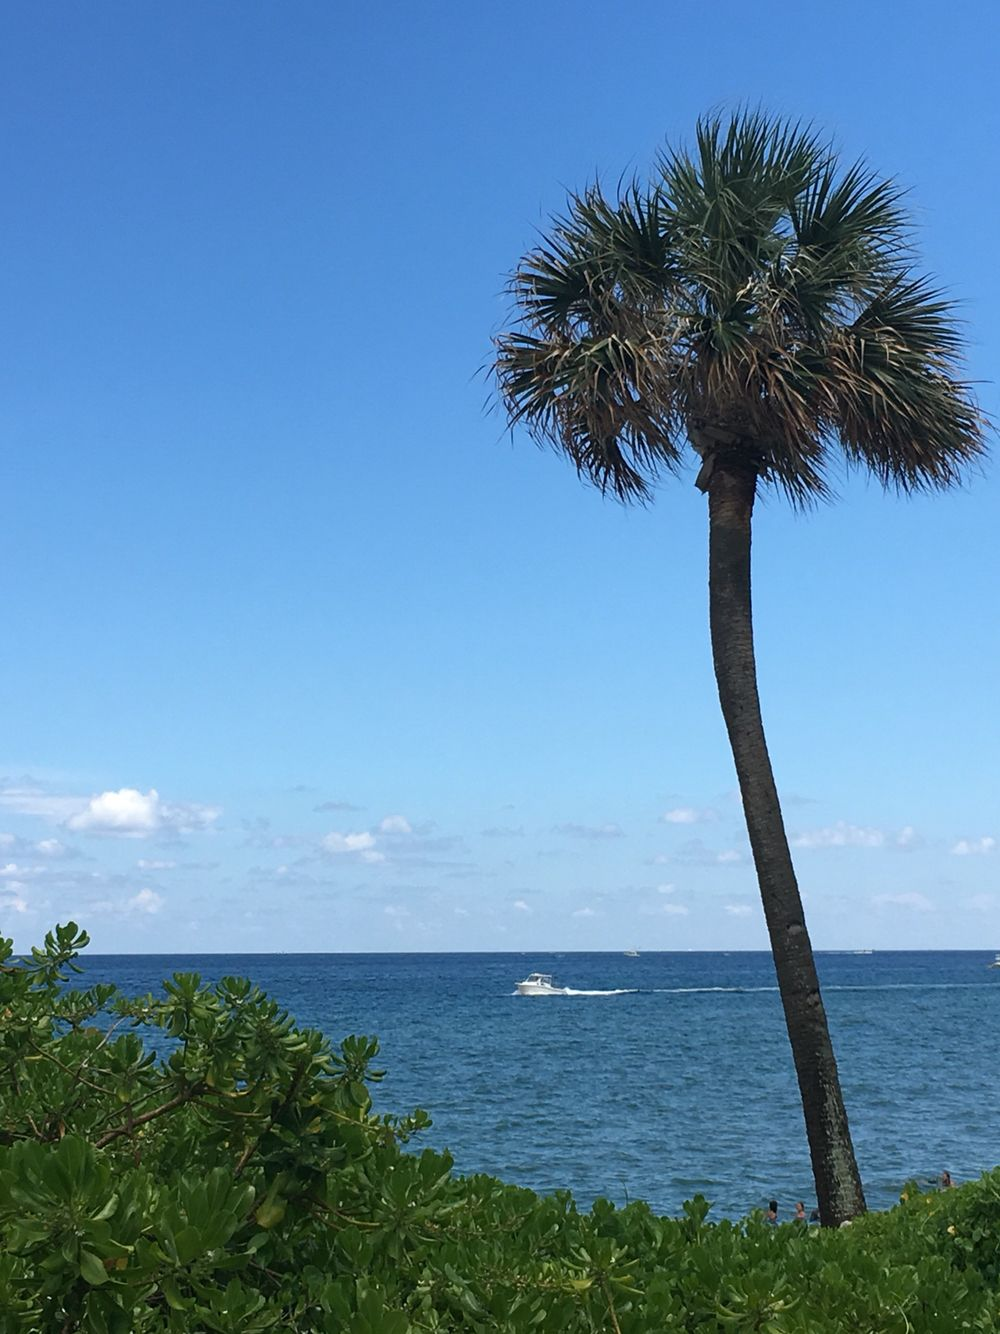 Deerfield Beach, Florida | Beautiful Places! | Pinterest | Deerfield ...